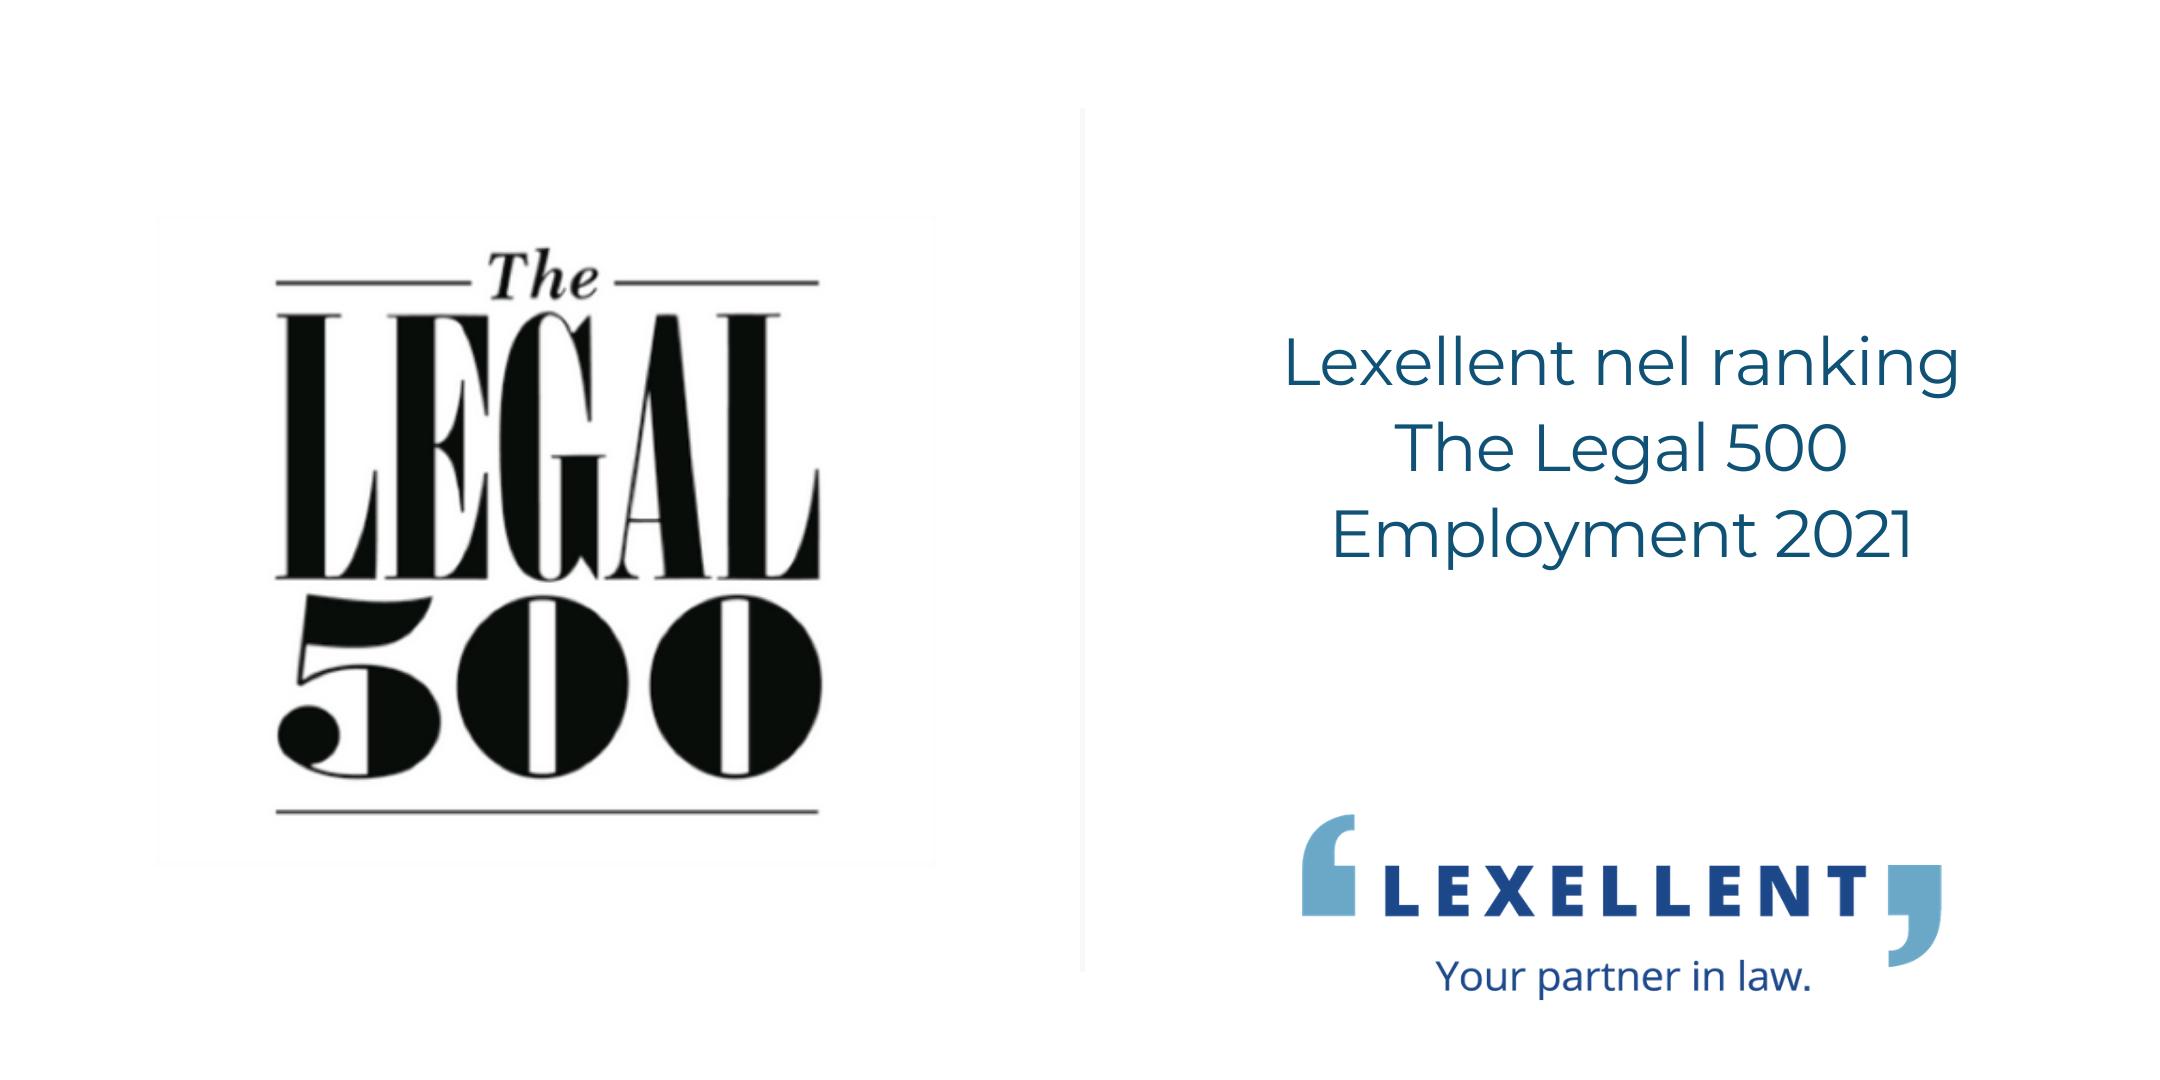 Lexellent nel ranking The Legal 500 Employment 2021